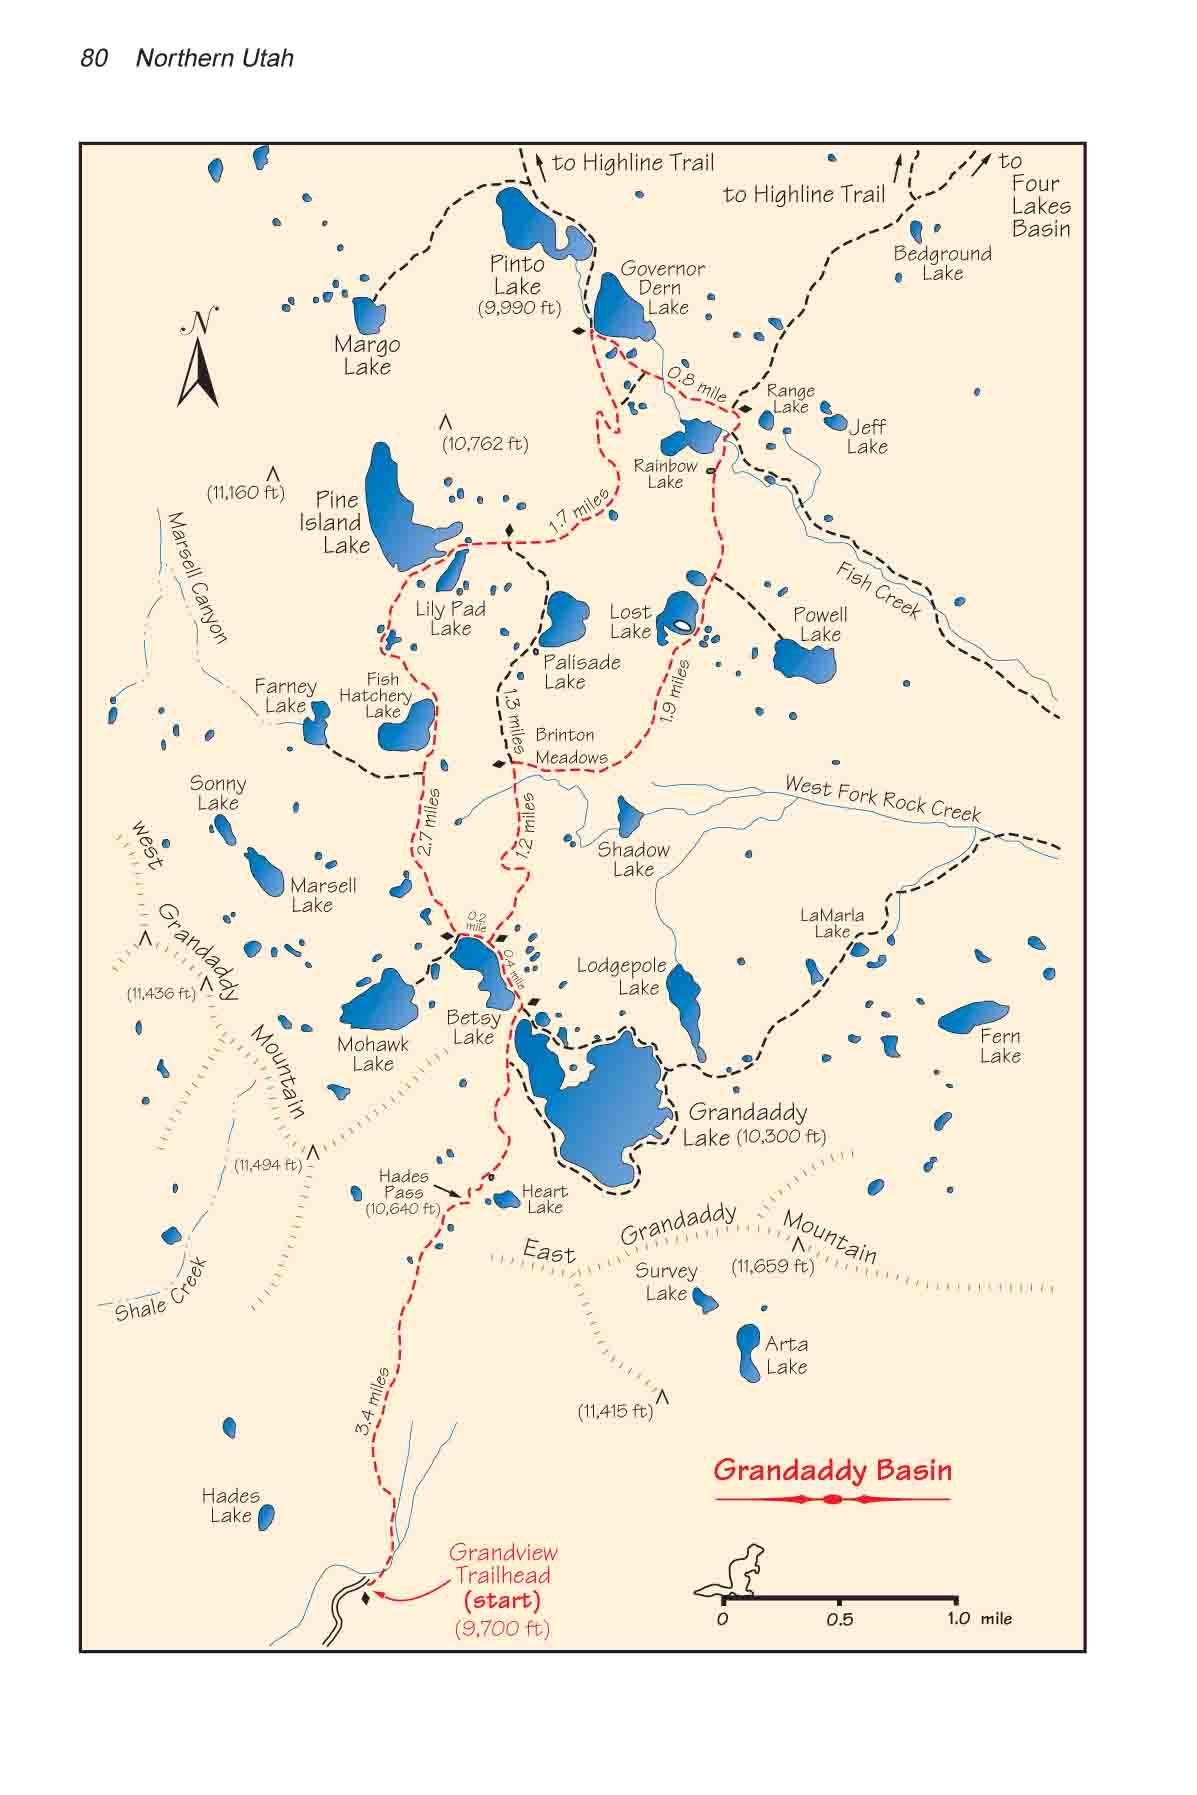 Grandaddy Basin High Uintas Wilderness Area